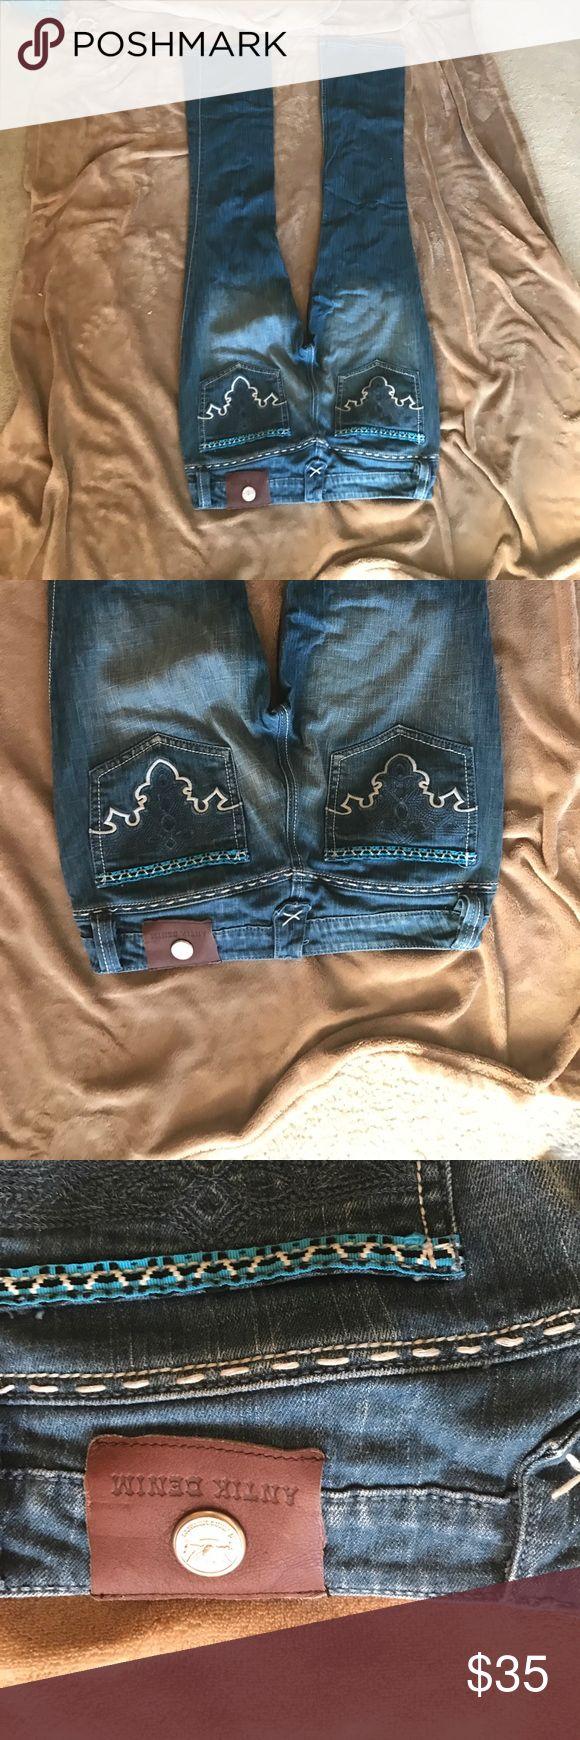 Antik bootcut like new jeans 30x34 fit like 29 Never worn Antik Batik Jeans Boot Cut